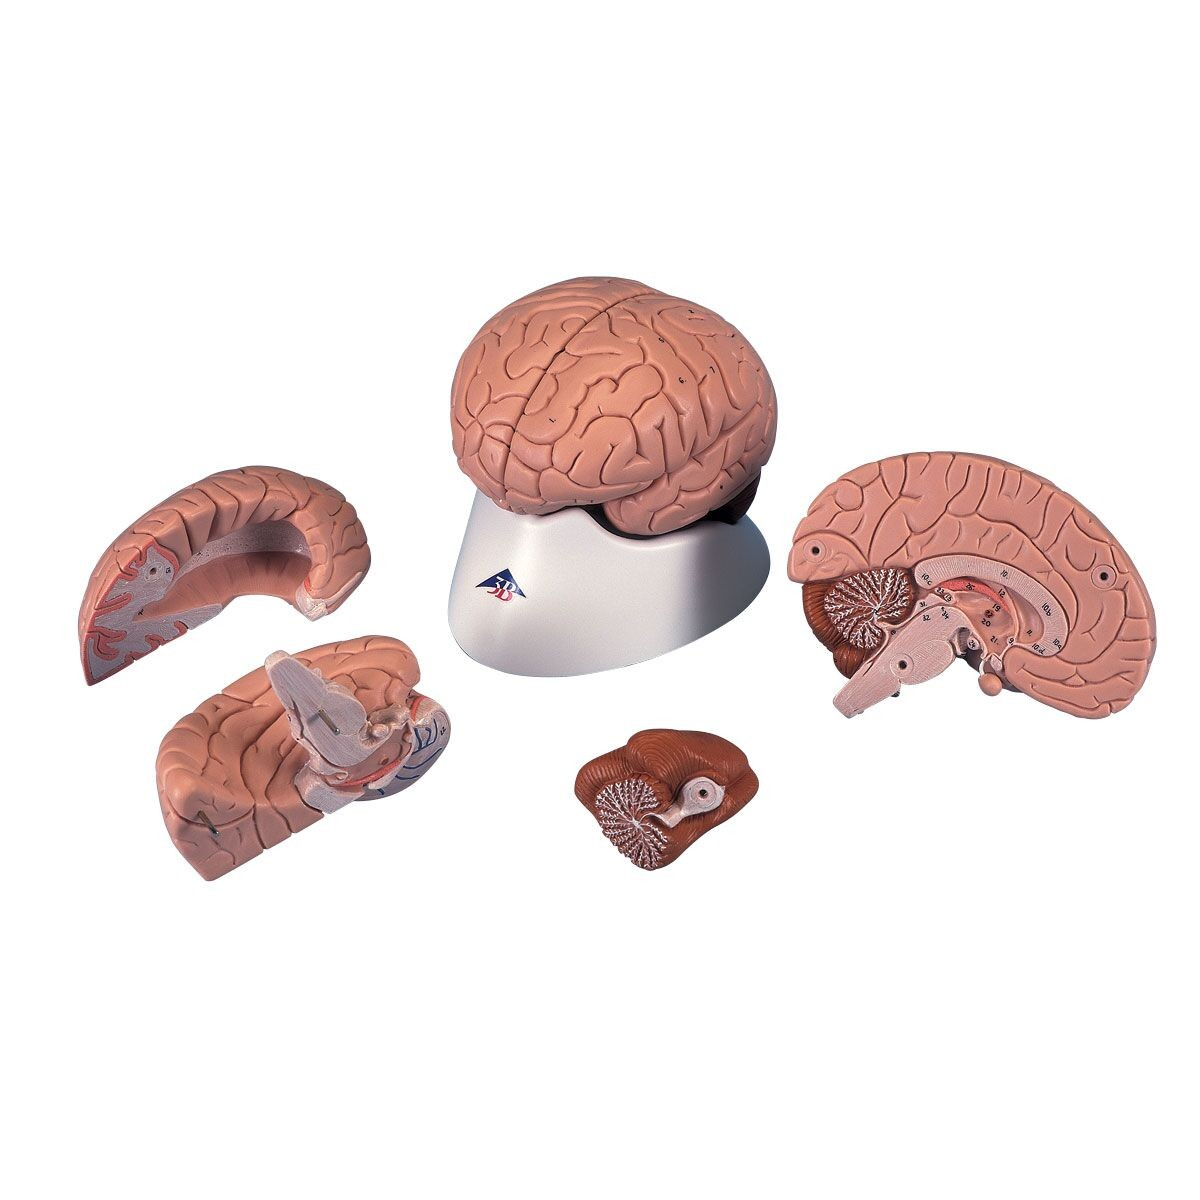 3B Brain - 4 Parts - Head, Brain, Nervous System - Human Anatomy ...